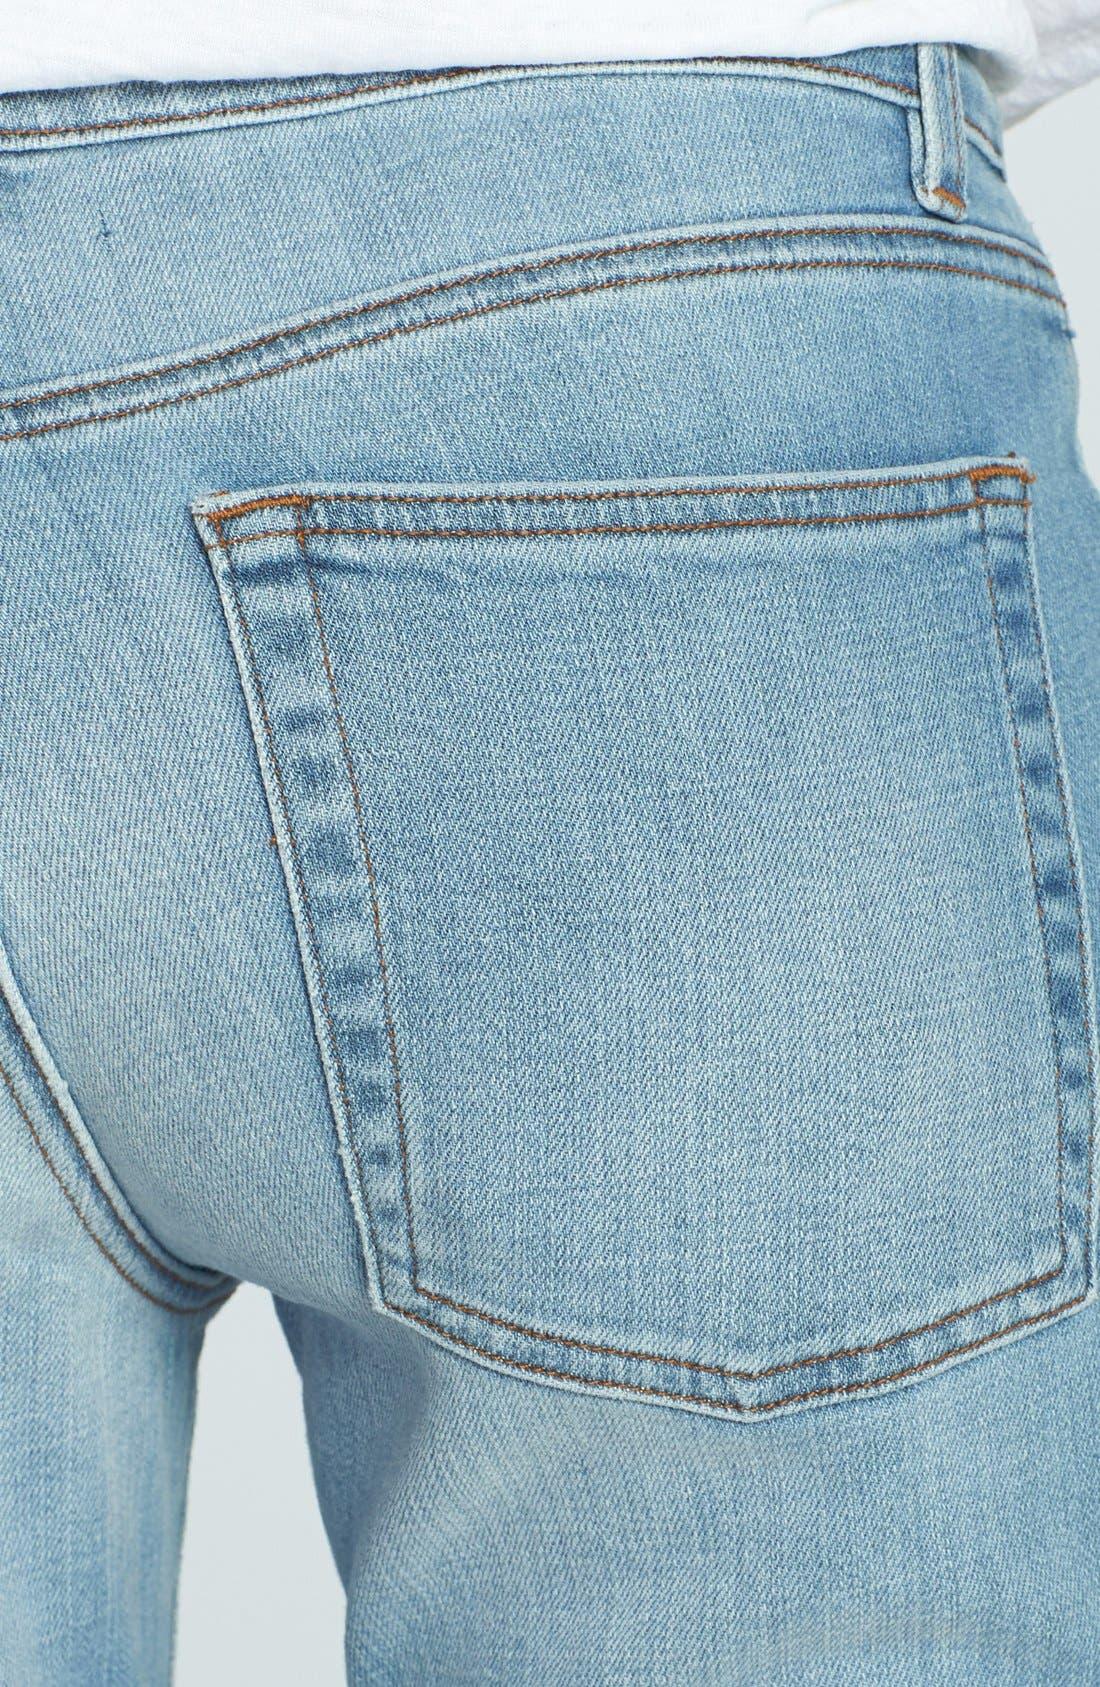 Alternate Image 3  - Eileen Fisher Boyfriend Jeans (Regular & Petite)